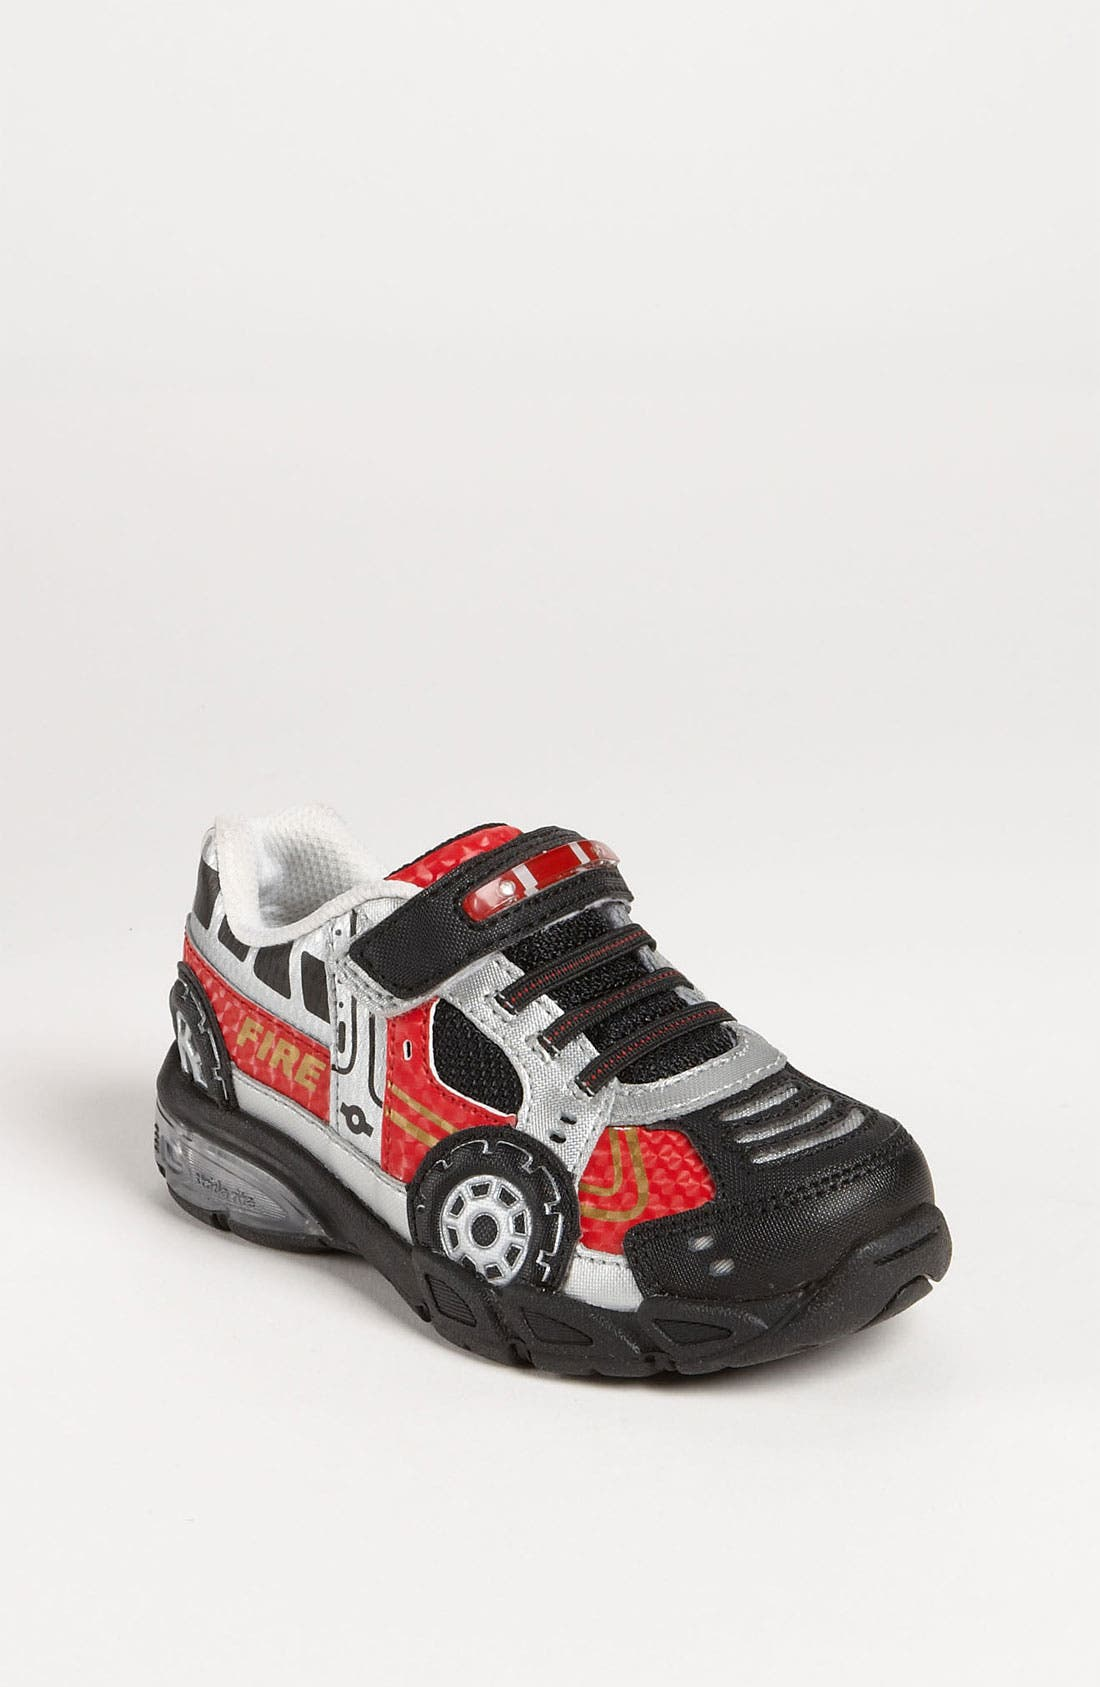 Alternate Image 1 Selected - Stride Rite 'Vroomz' Sneaker (Walker & Toddler)